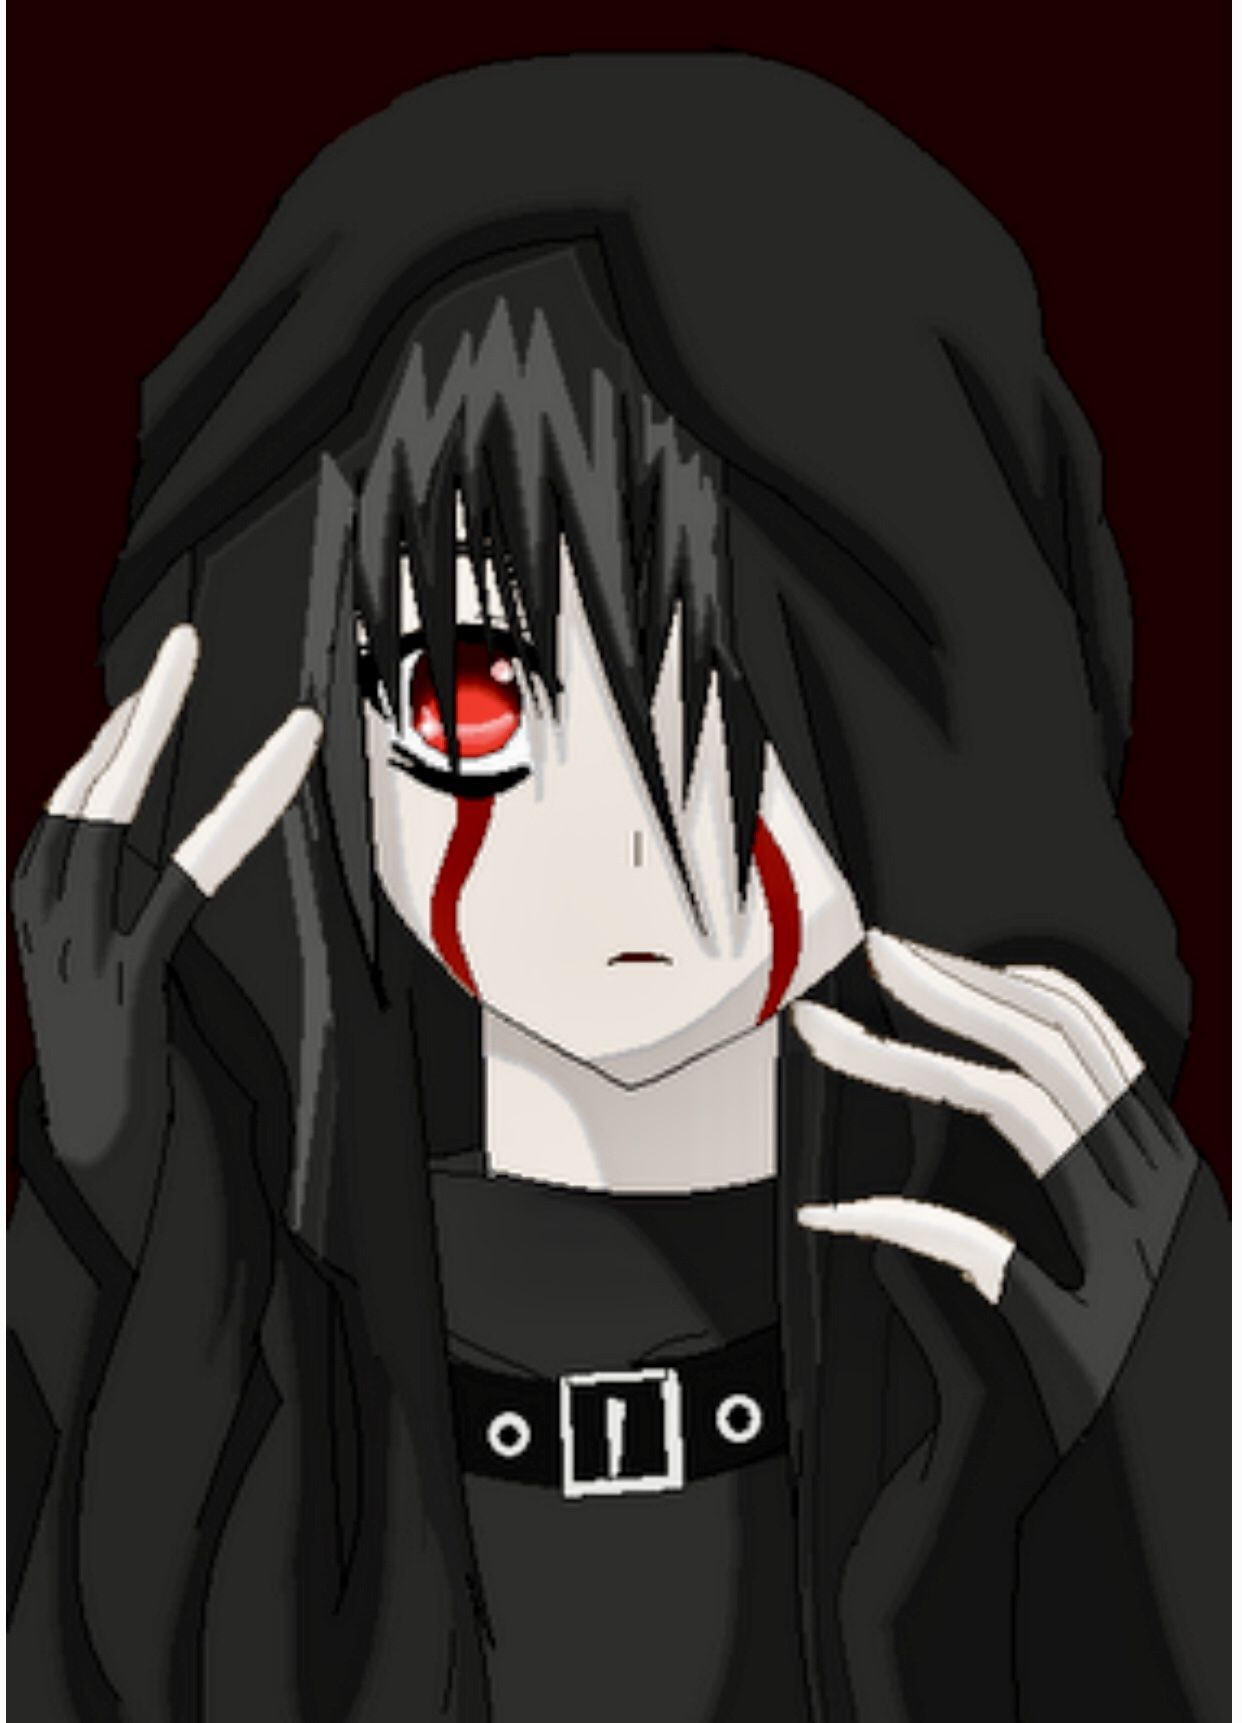 Sad Boy Emo Anime Wallpapers - Wallpaper Cave